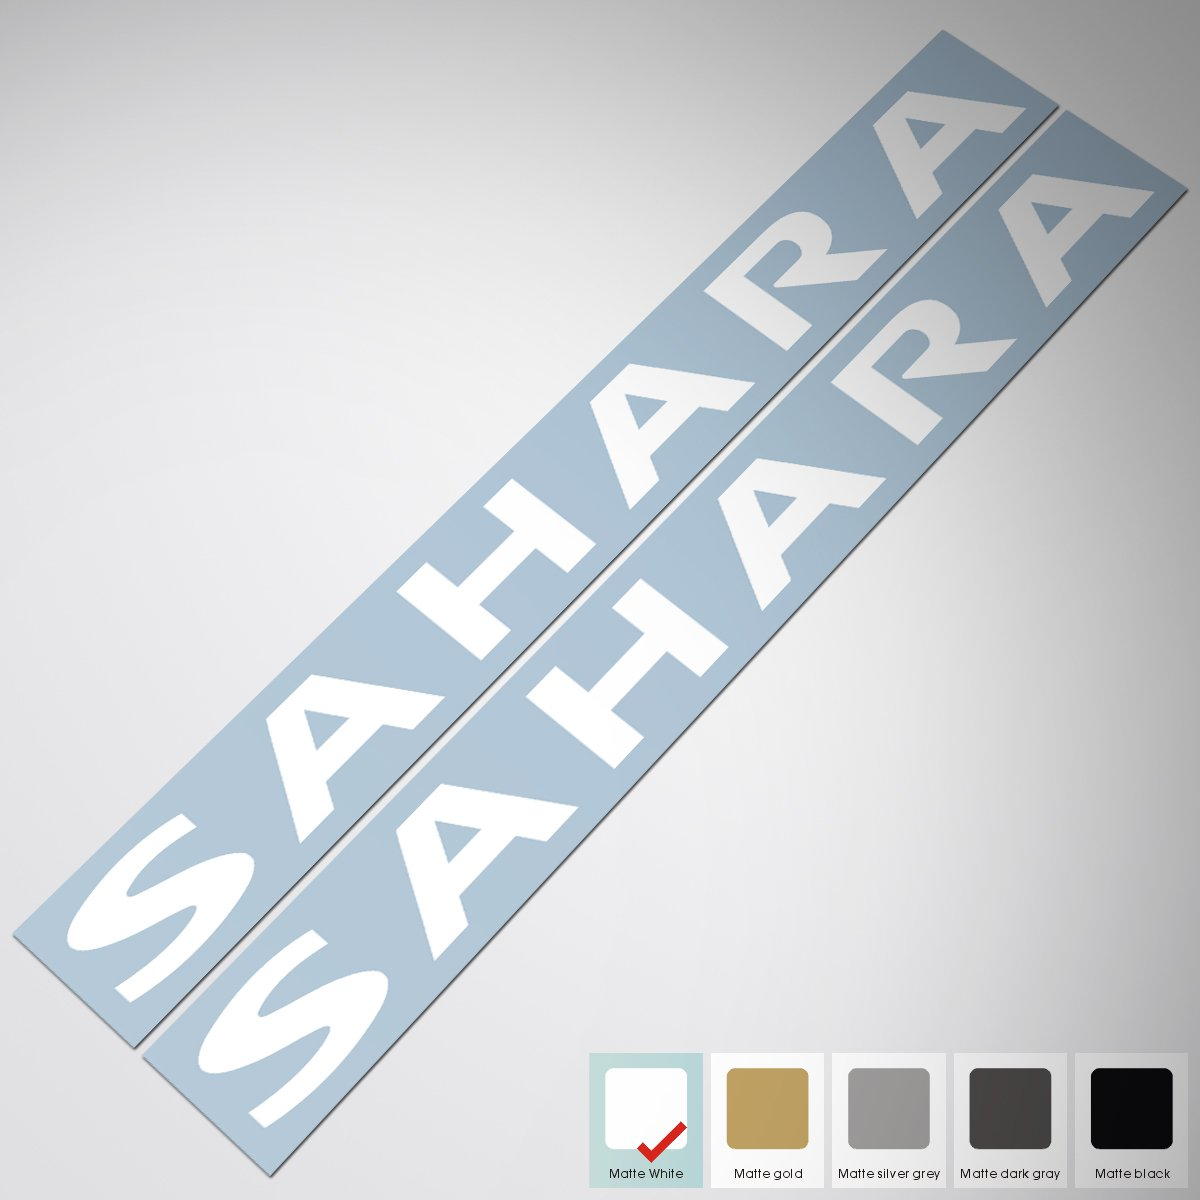 Matte White Demupai jeep wrangler sahara Hood Decals Sticker Autodream sticker --50cm4.3cm